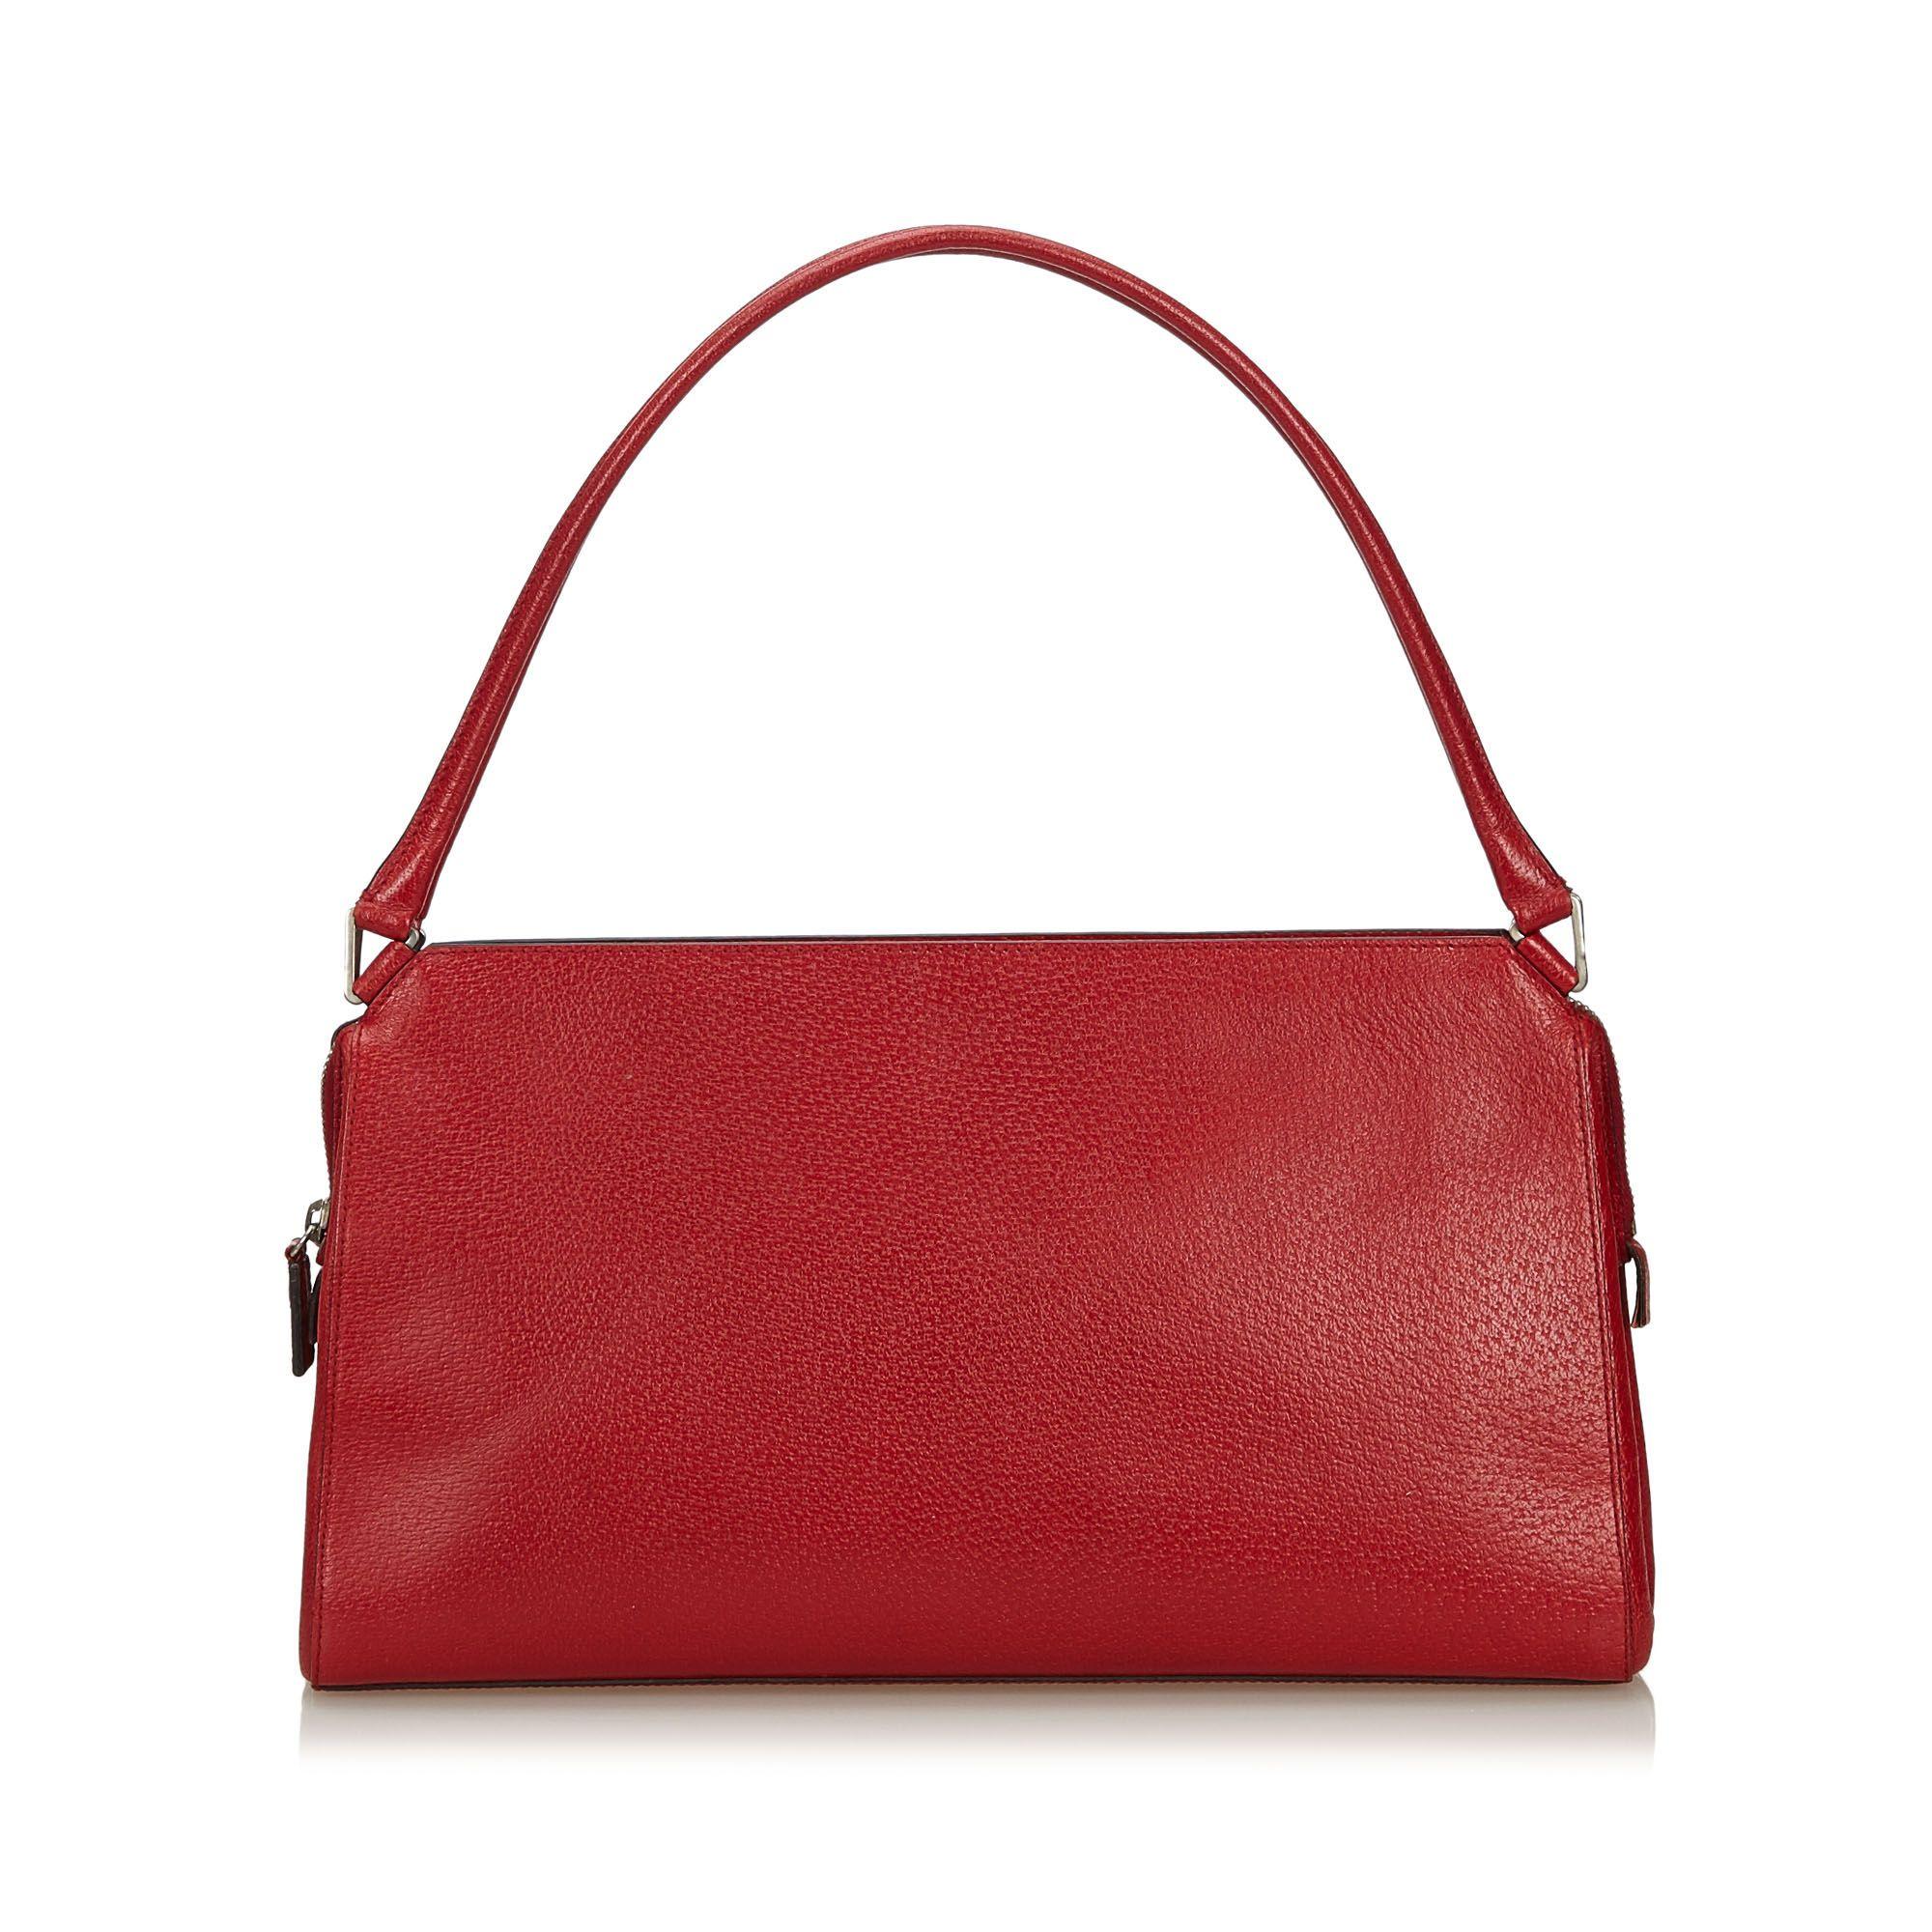 Vintage Prada Leather Baguette Red